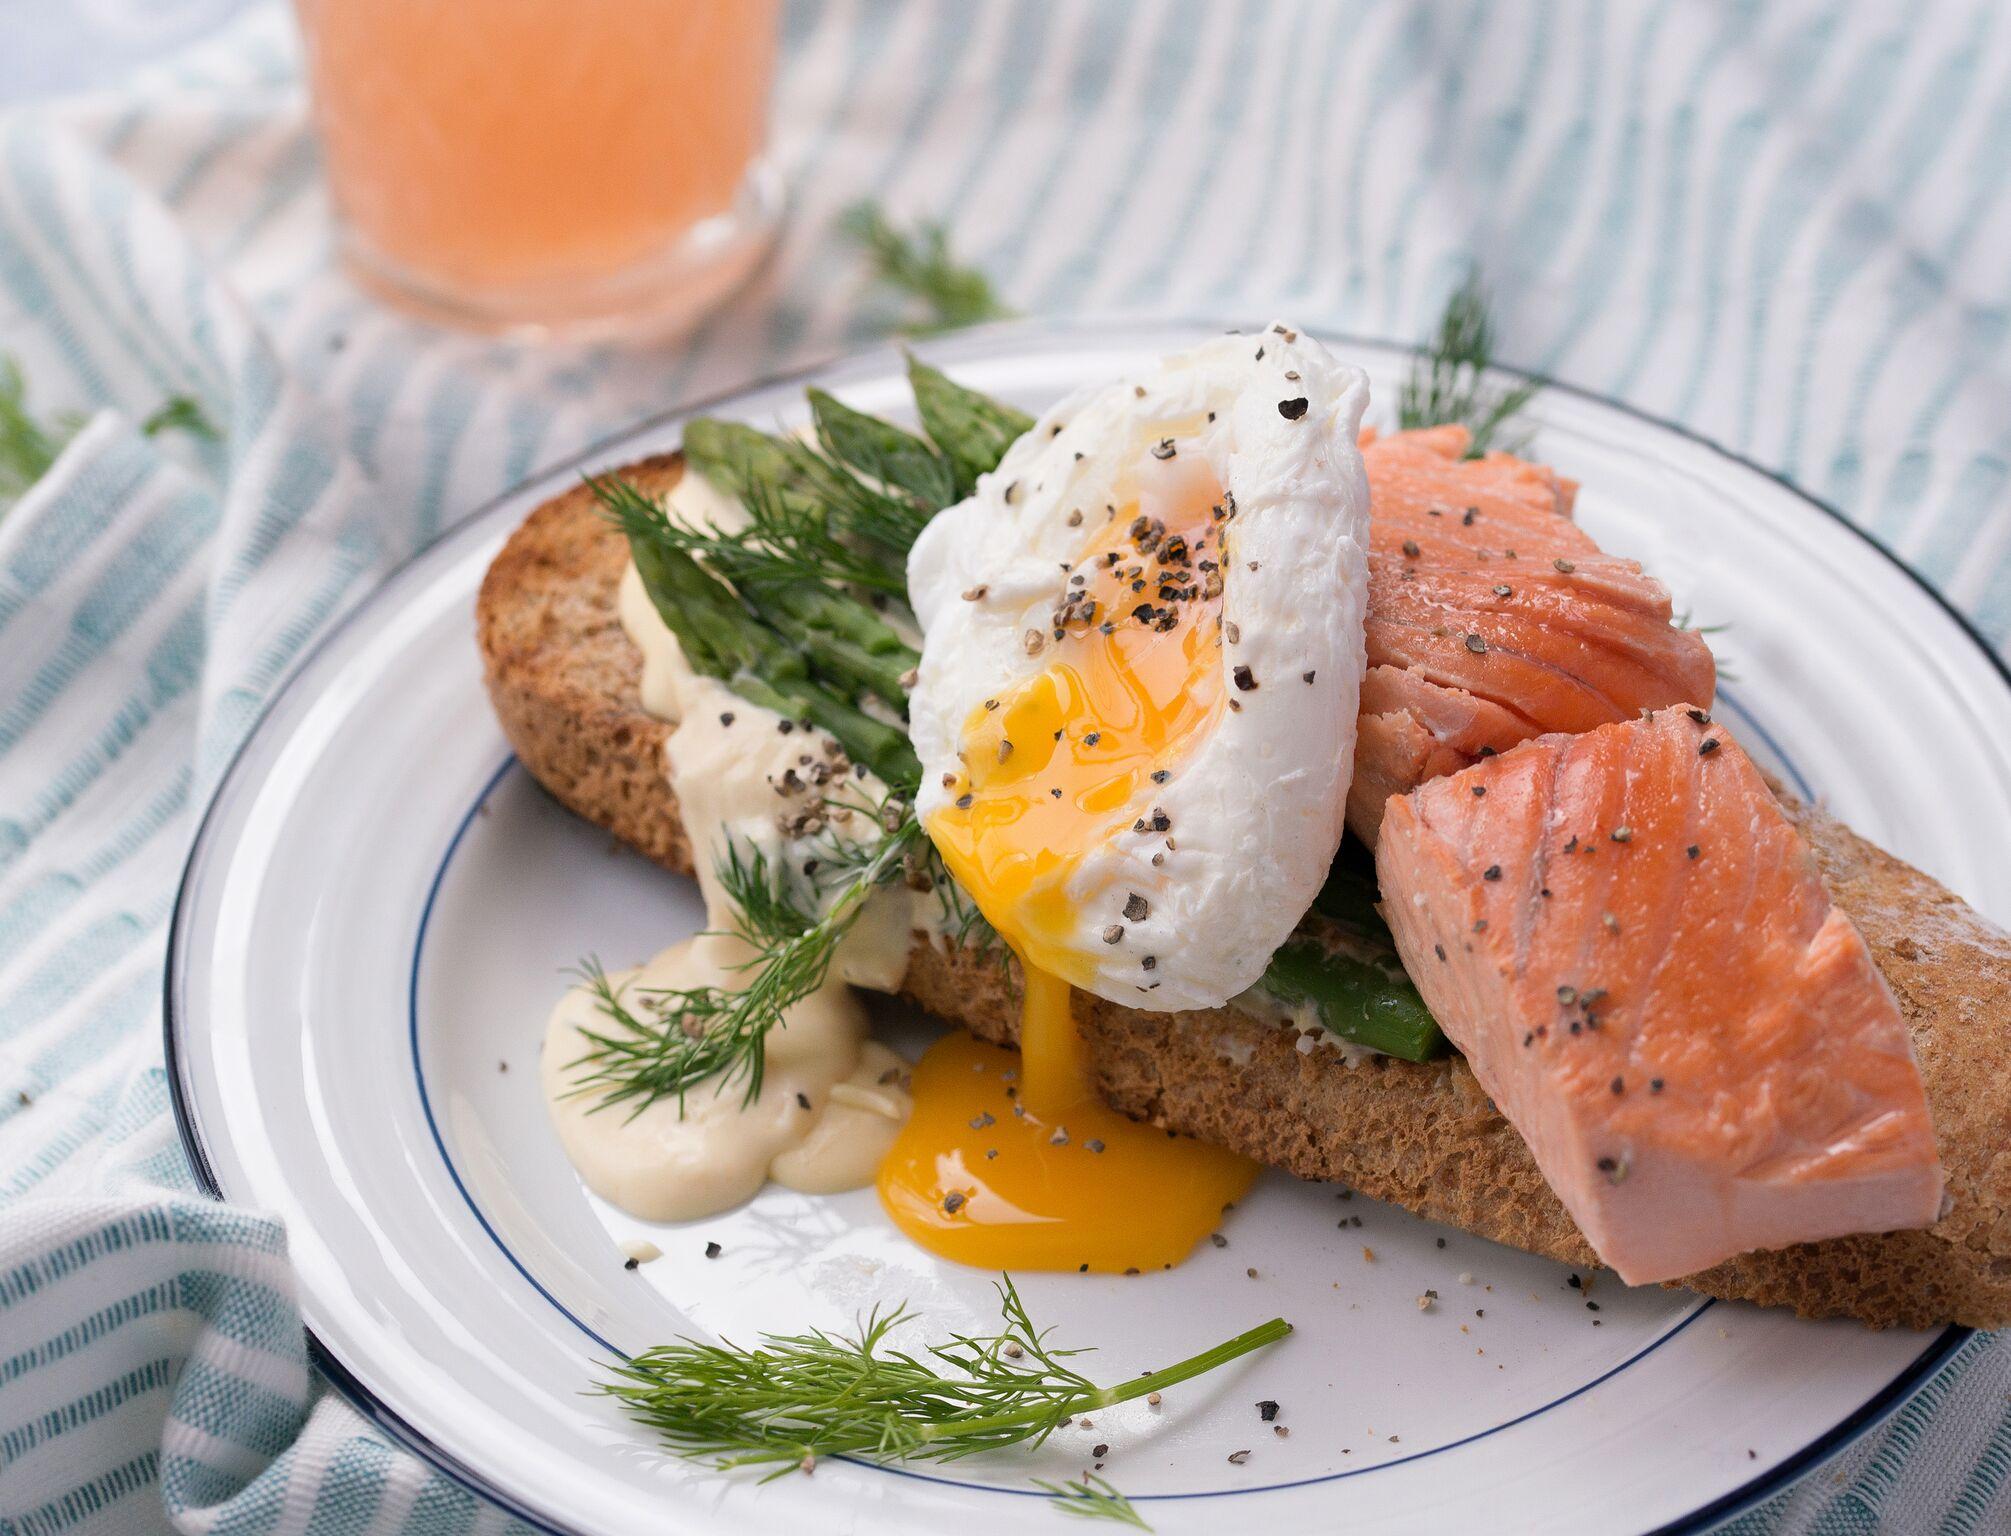 BigFish Brand Organic Salmon and Poached Egg on Toast